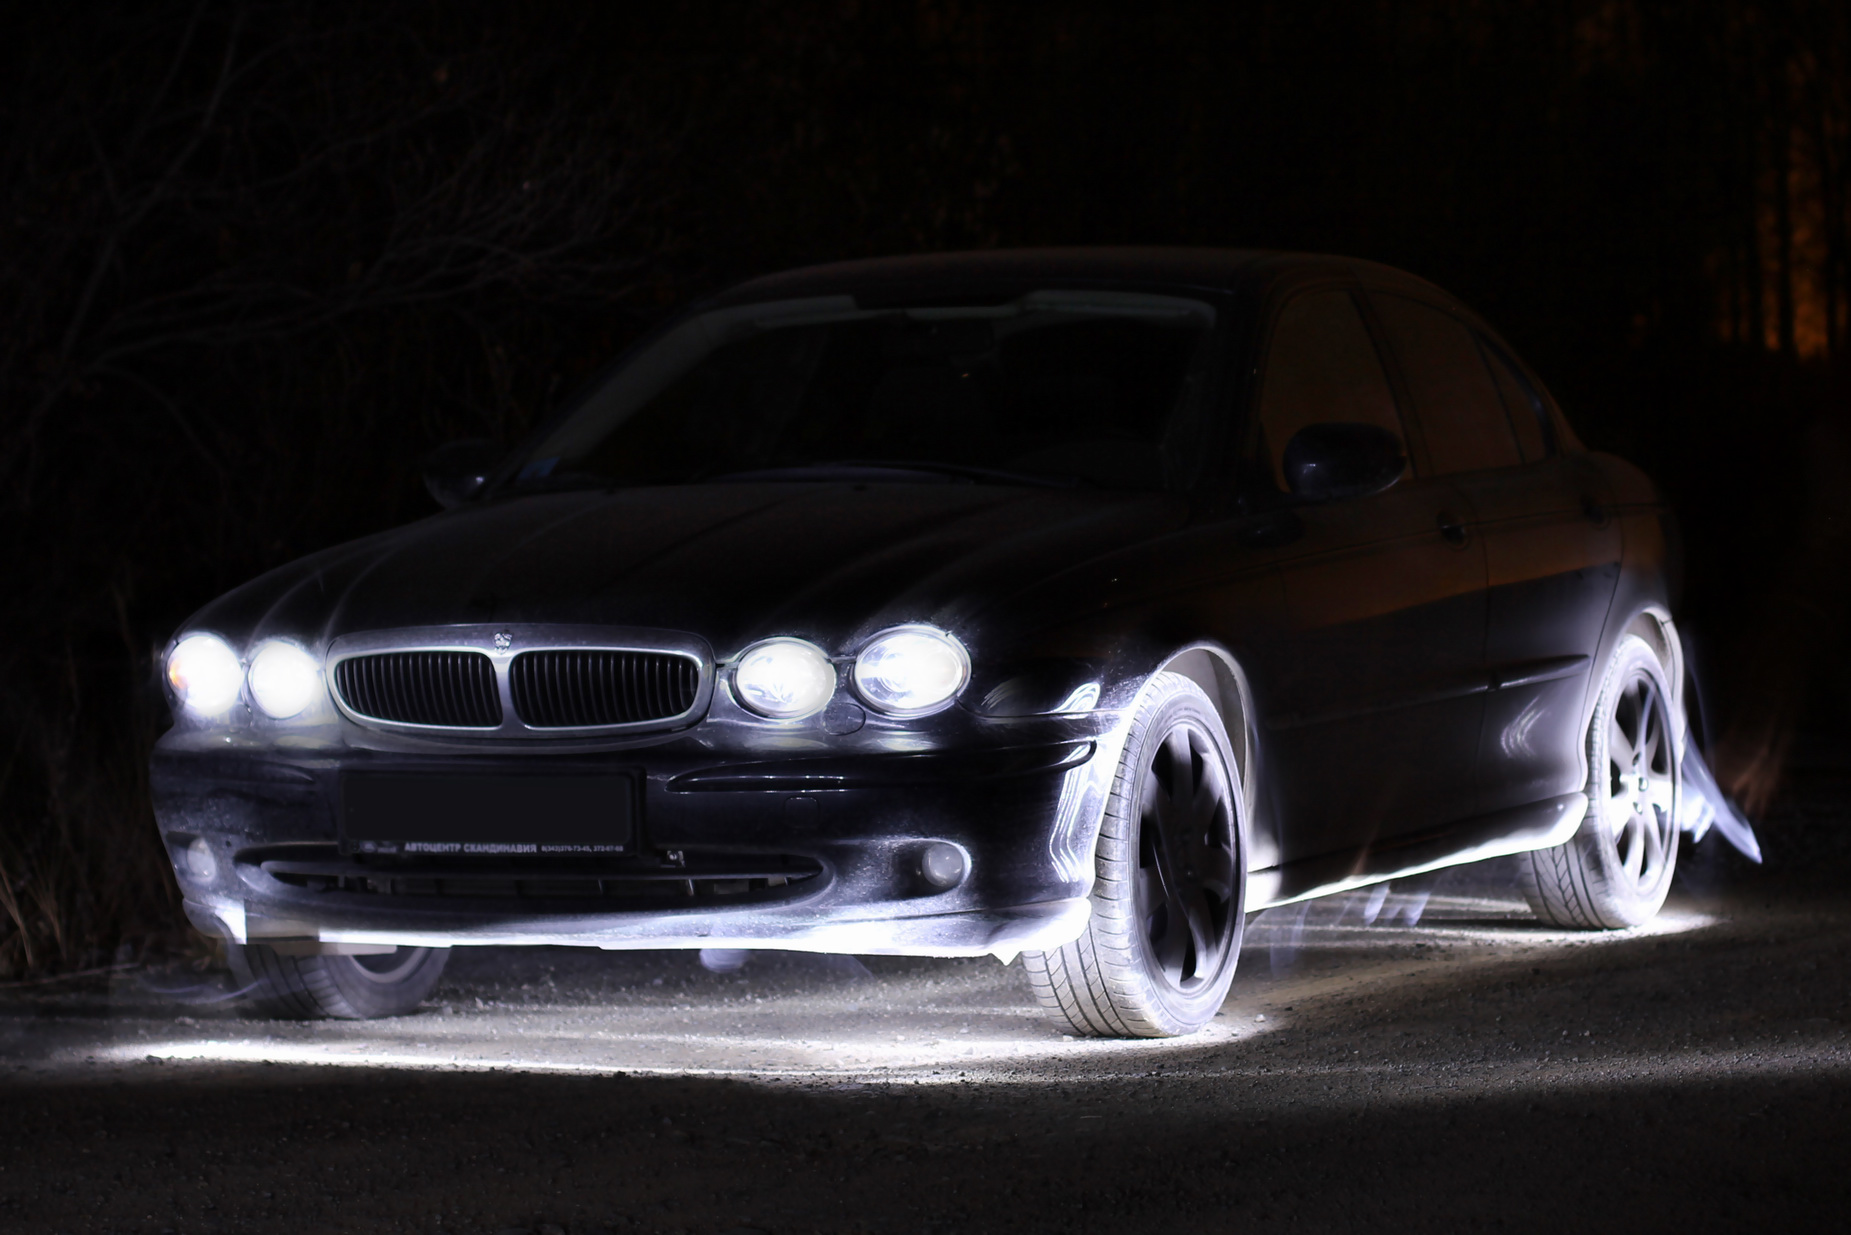 Fabia Light - Jaguar x-type by Fil3D